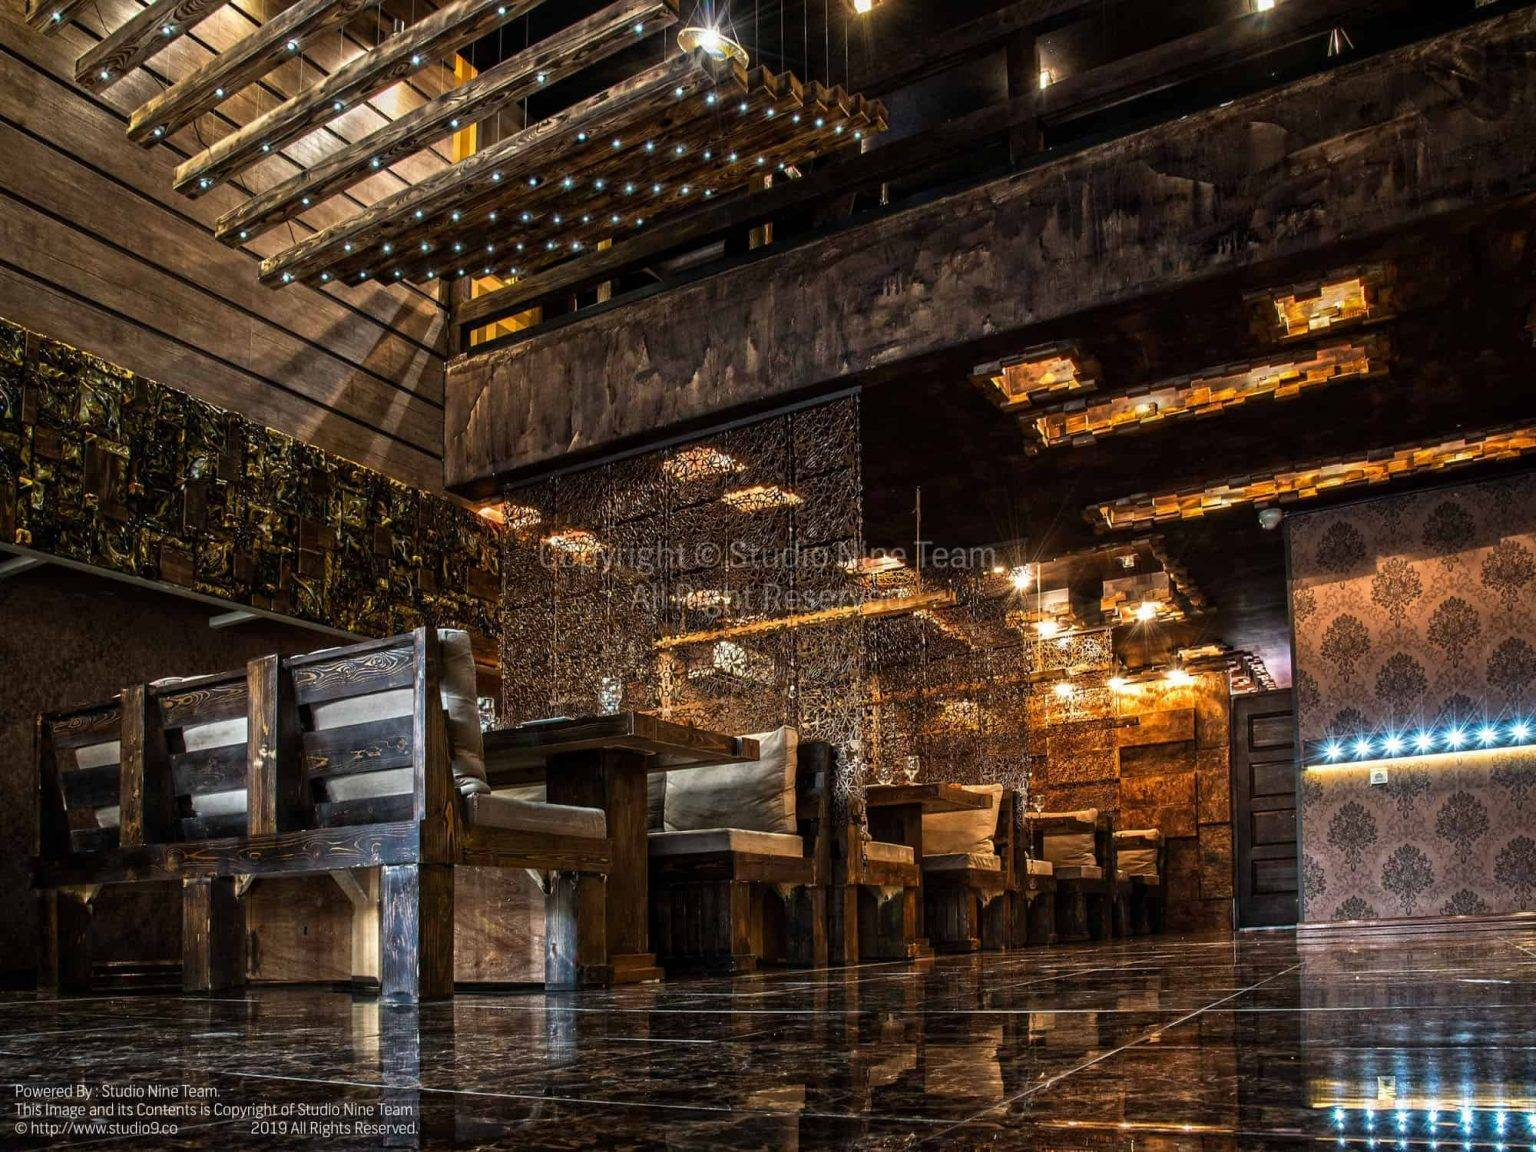 عکاسی محیط رستوران | تعرفه عکاسی رستوران